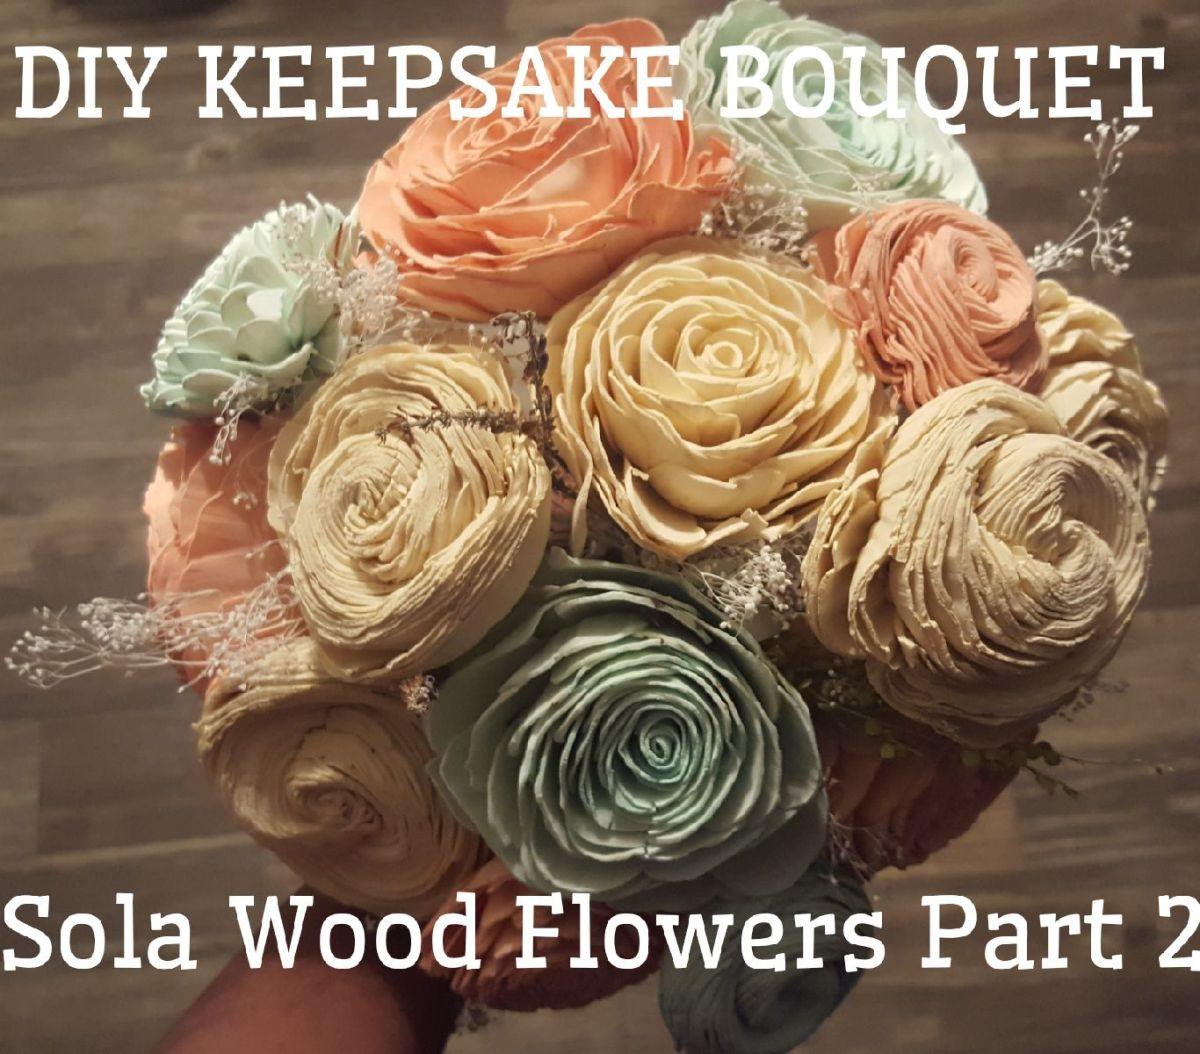 Diy keepsake bridal bouquet sola wood flowers part 2 diy keepsake bridal bouquet sola wood flowers part 2 weddingwednesday queen thrifty izmirmasajfo